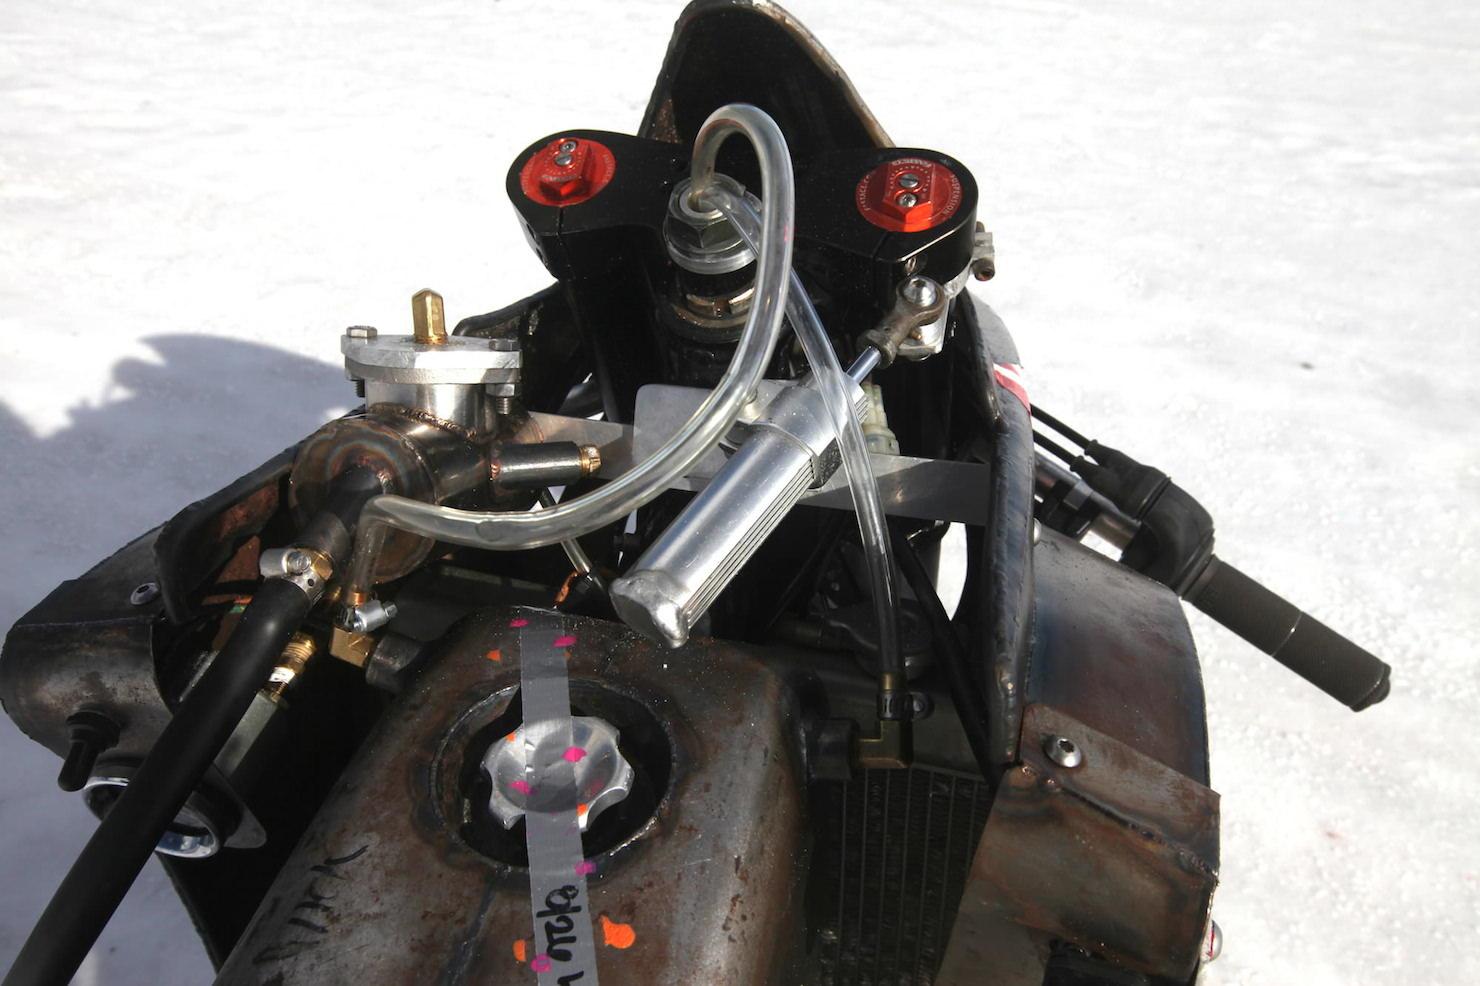 Turbo Yamaha Salt Flat Racer by Super Rat 6